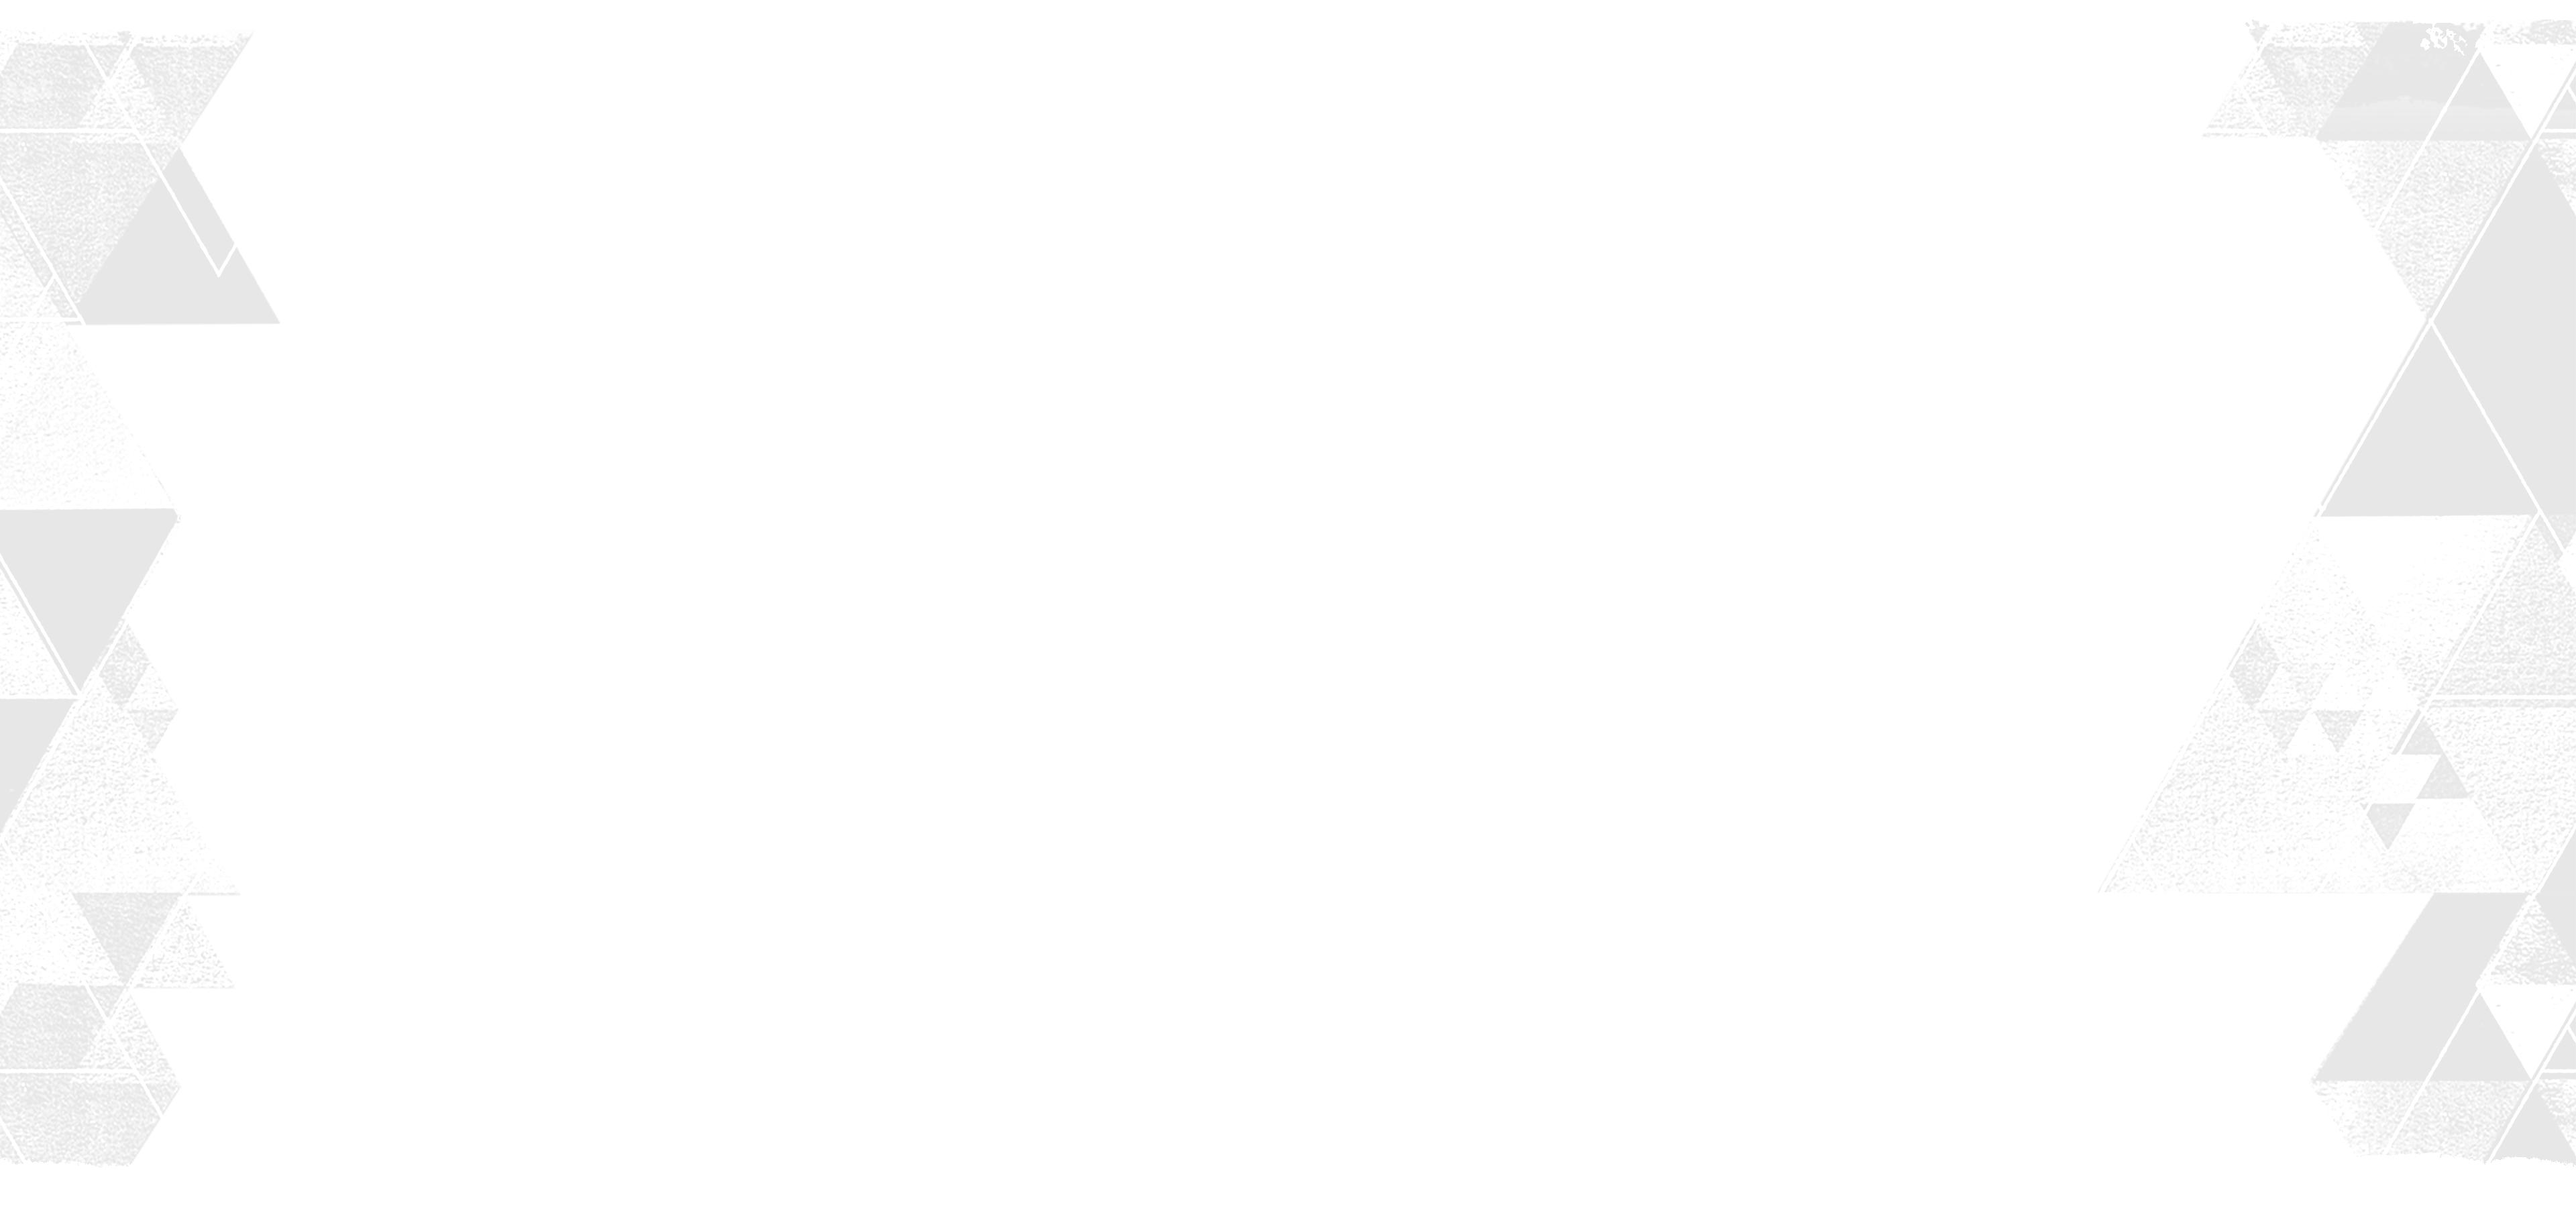 Horizon white background